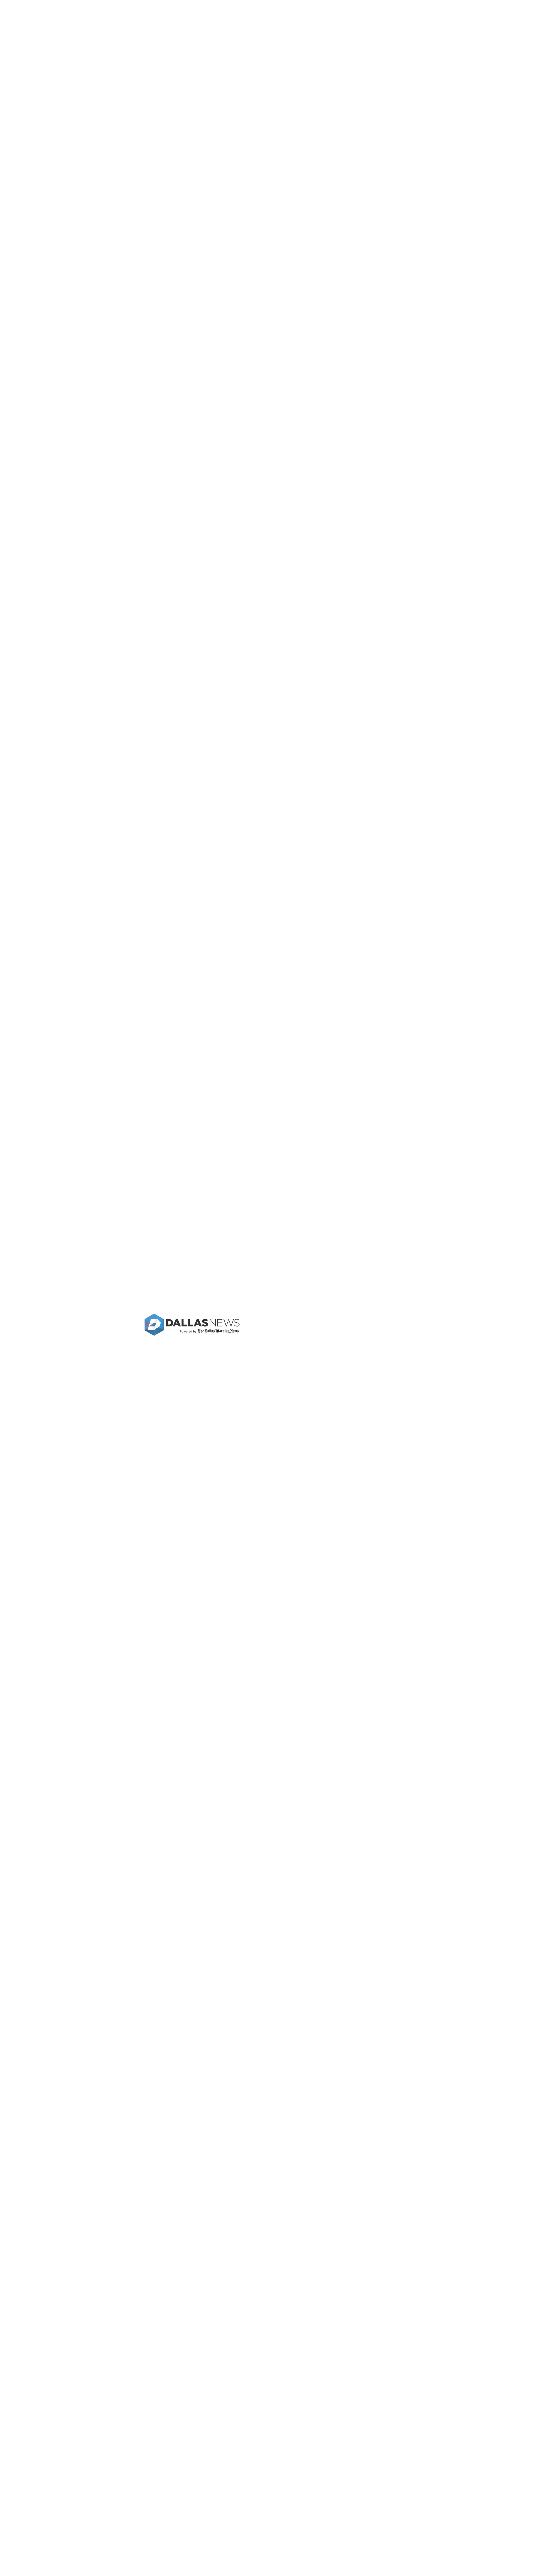 dallasnews.com at Sunday March 11, 2018, 9:02 p.m. UTC